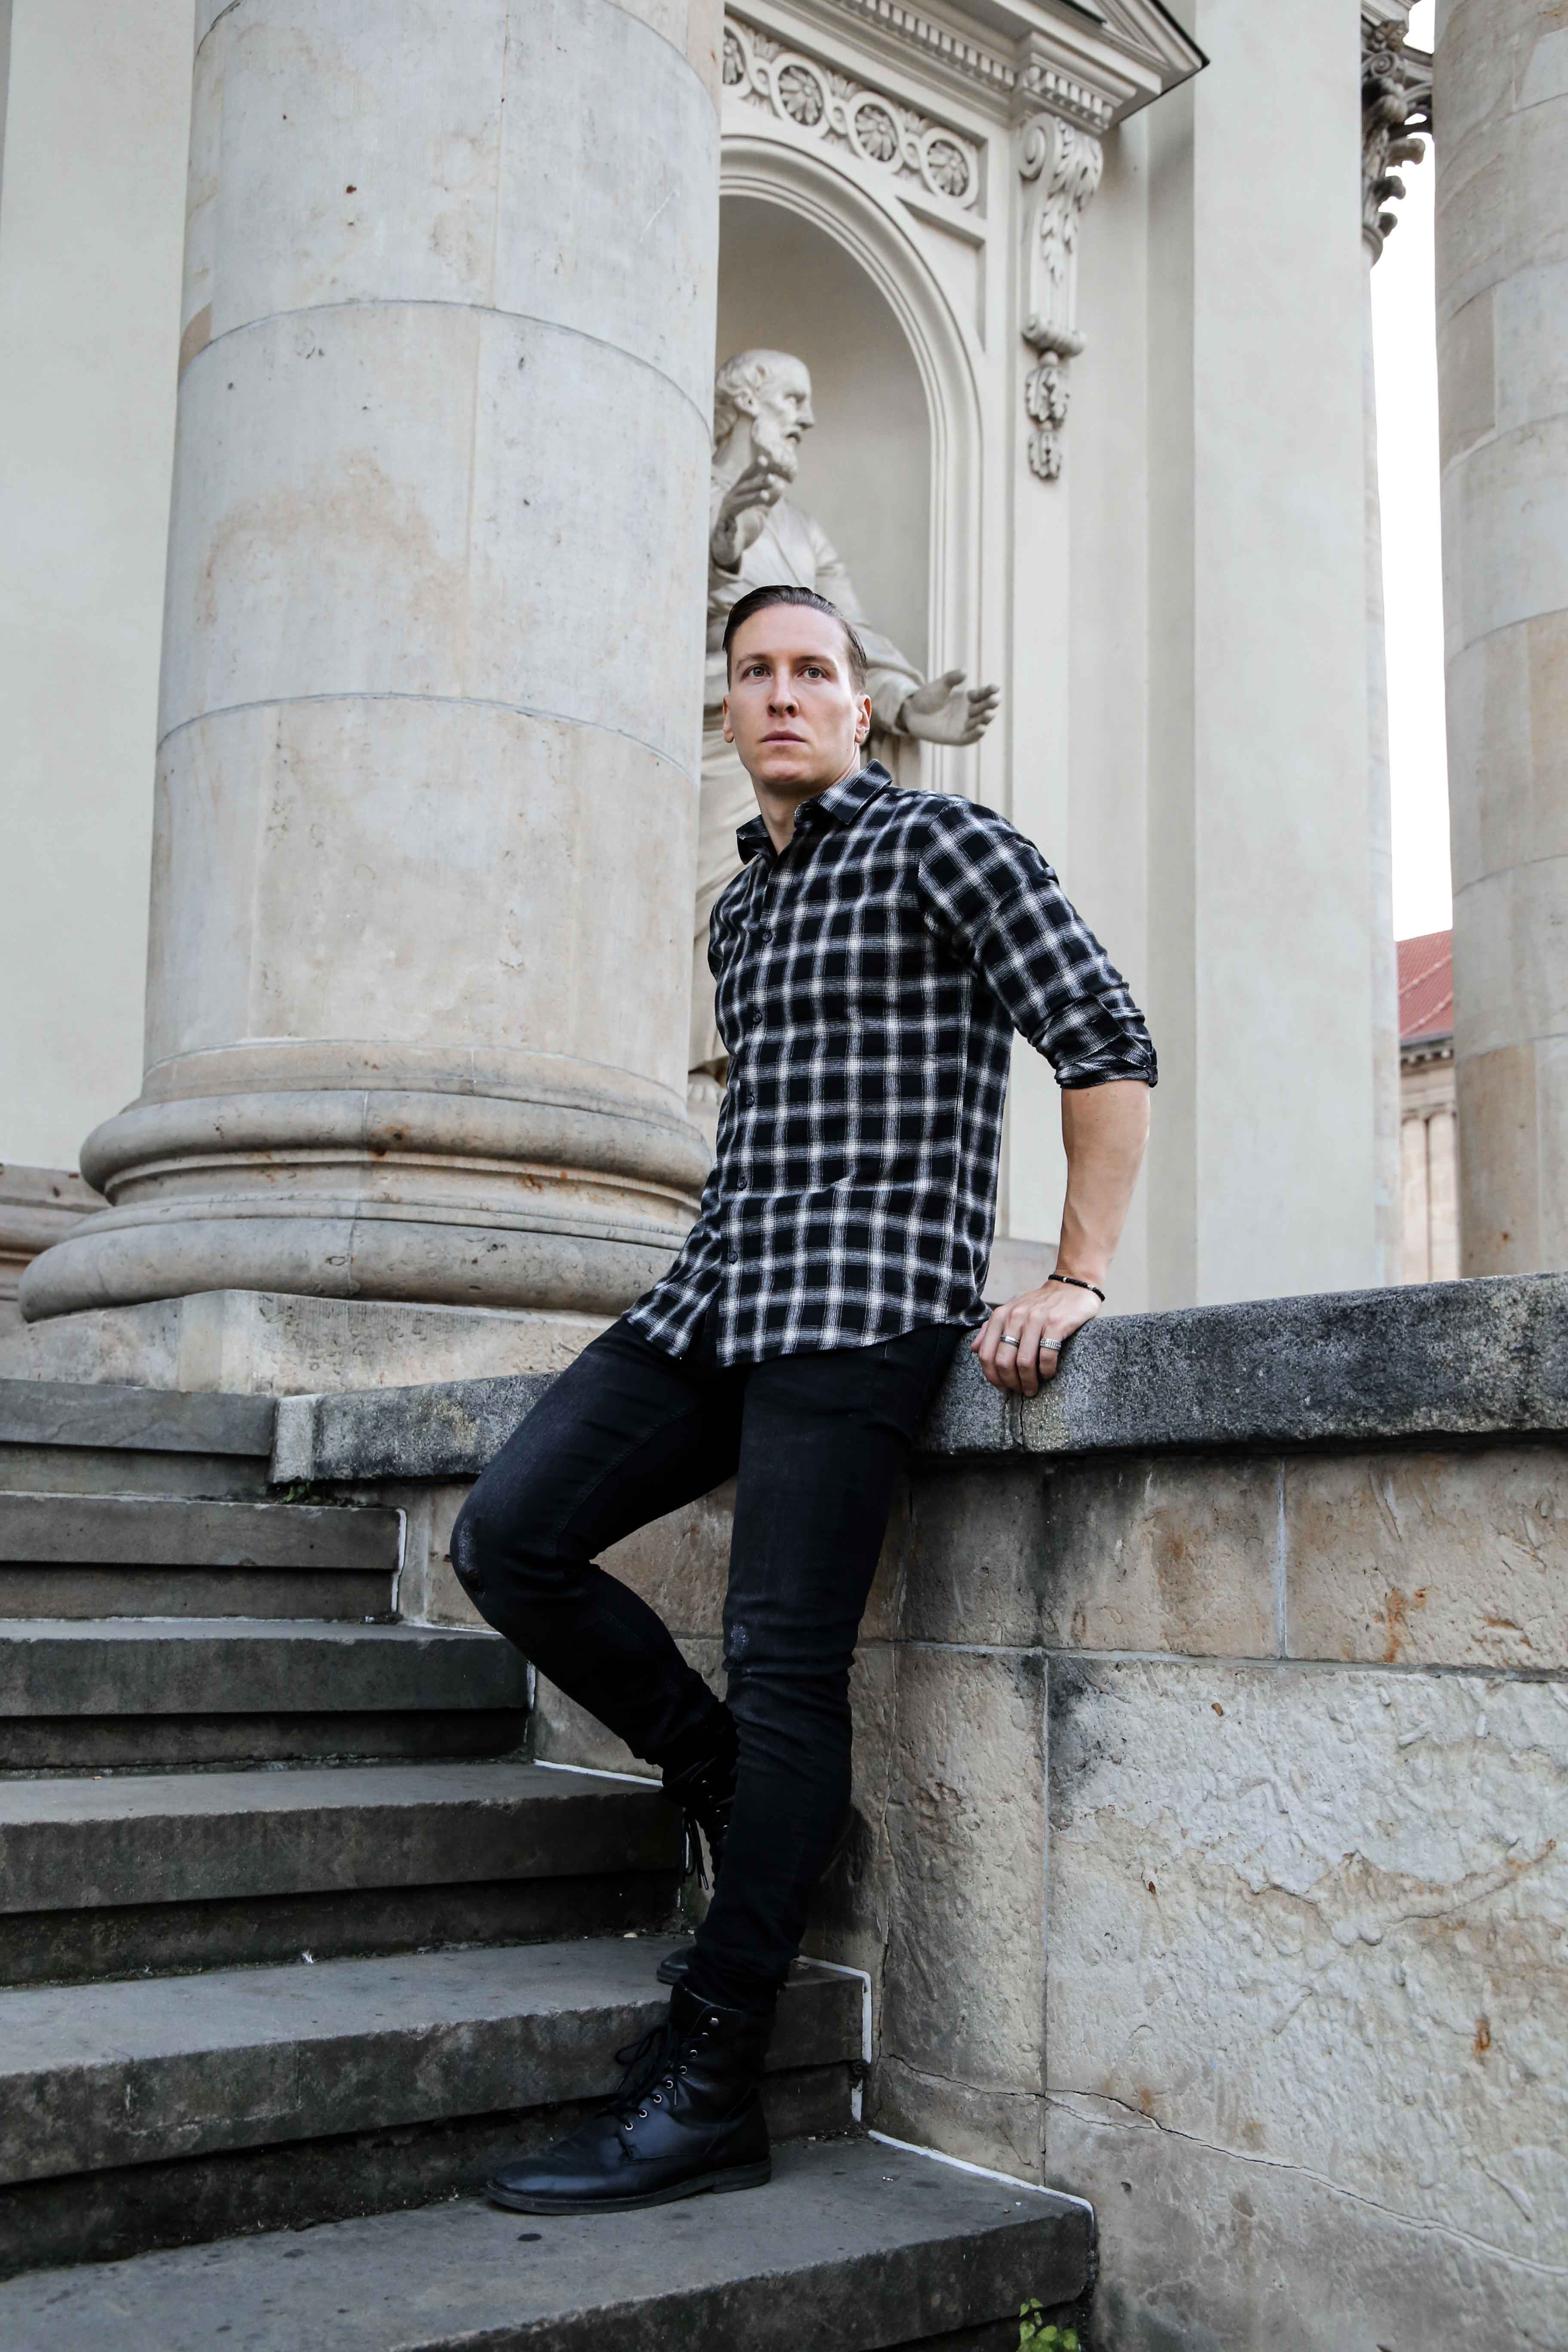 september-outfit-schwarzes-karohemd-totenkopf-armbänder-modeblog-fashionlook-männerblog_9702